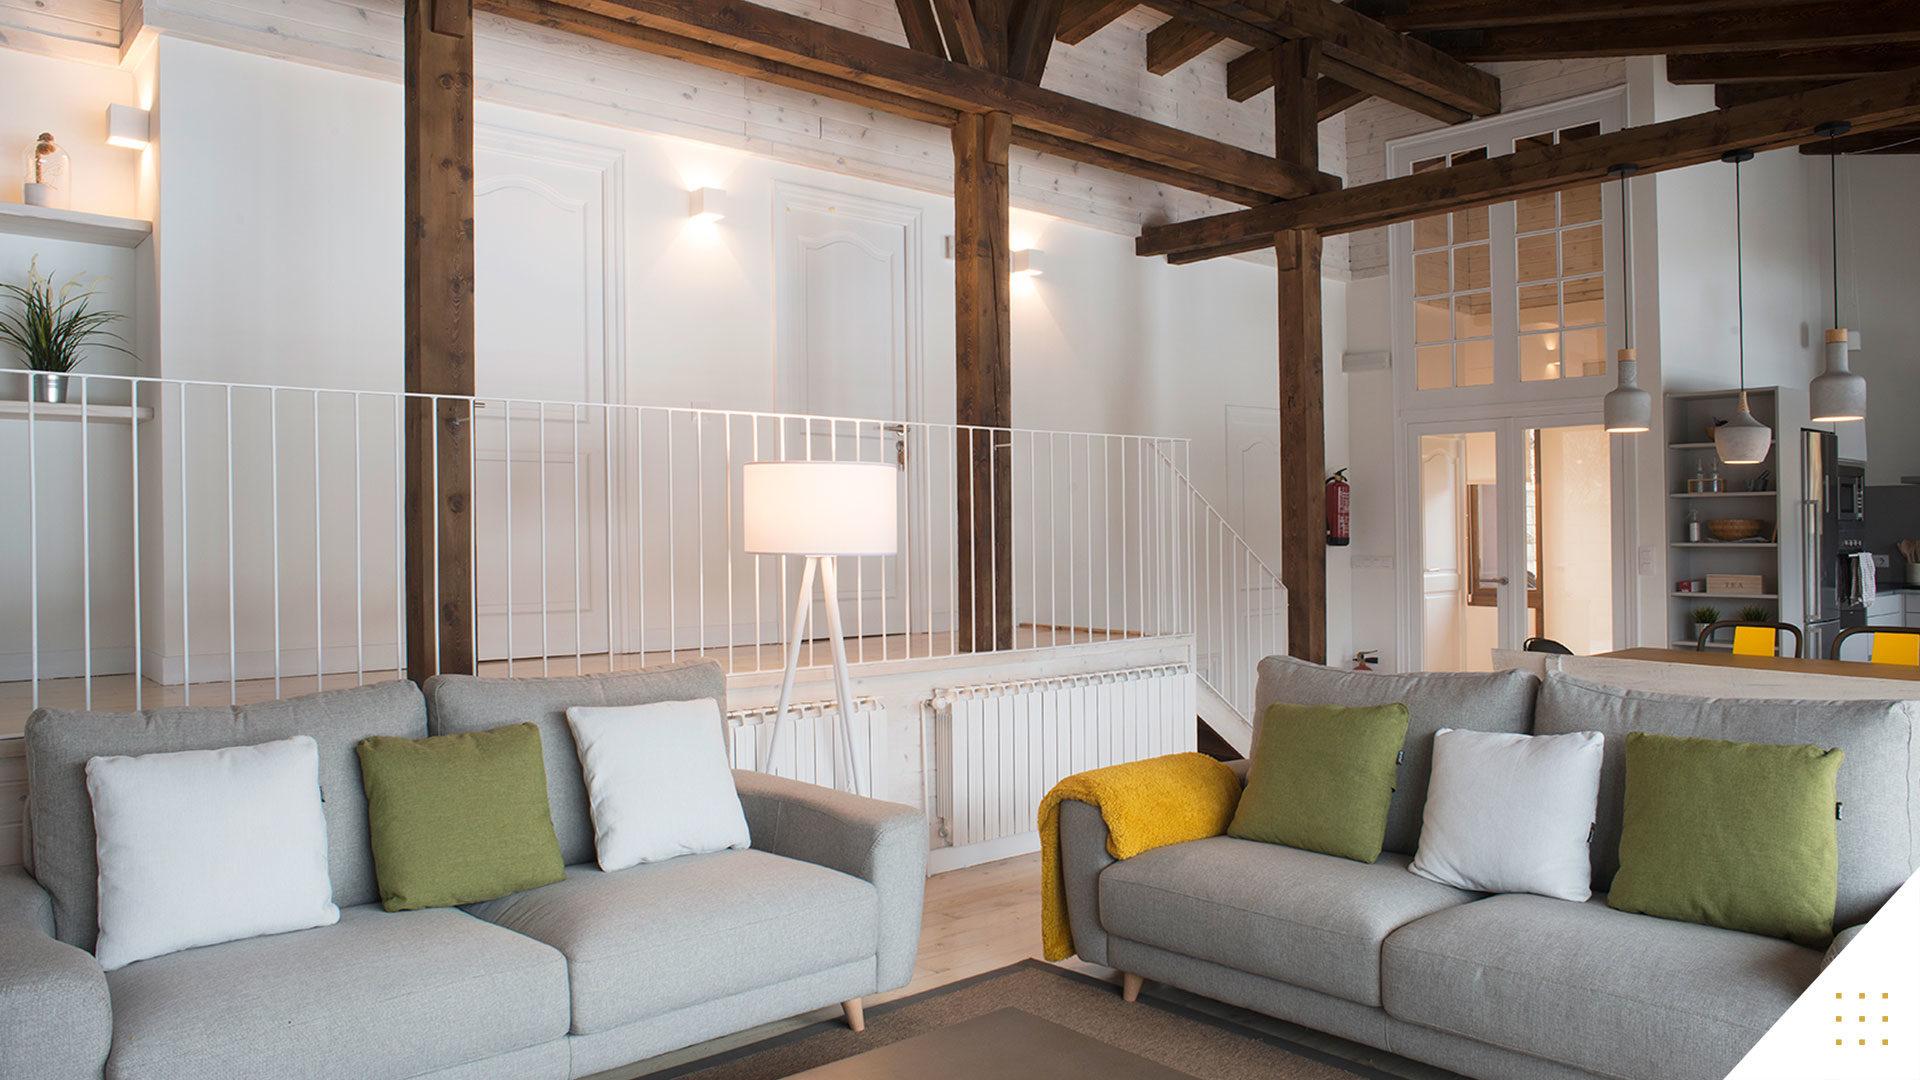 cal barida minimalisme i disseny, cava, turisme rual casa rural